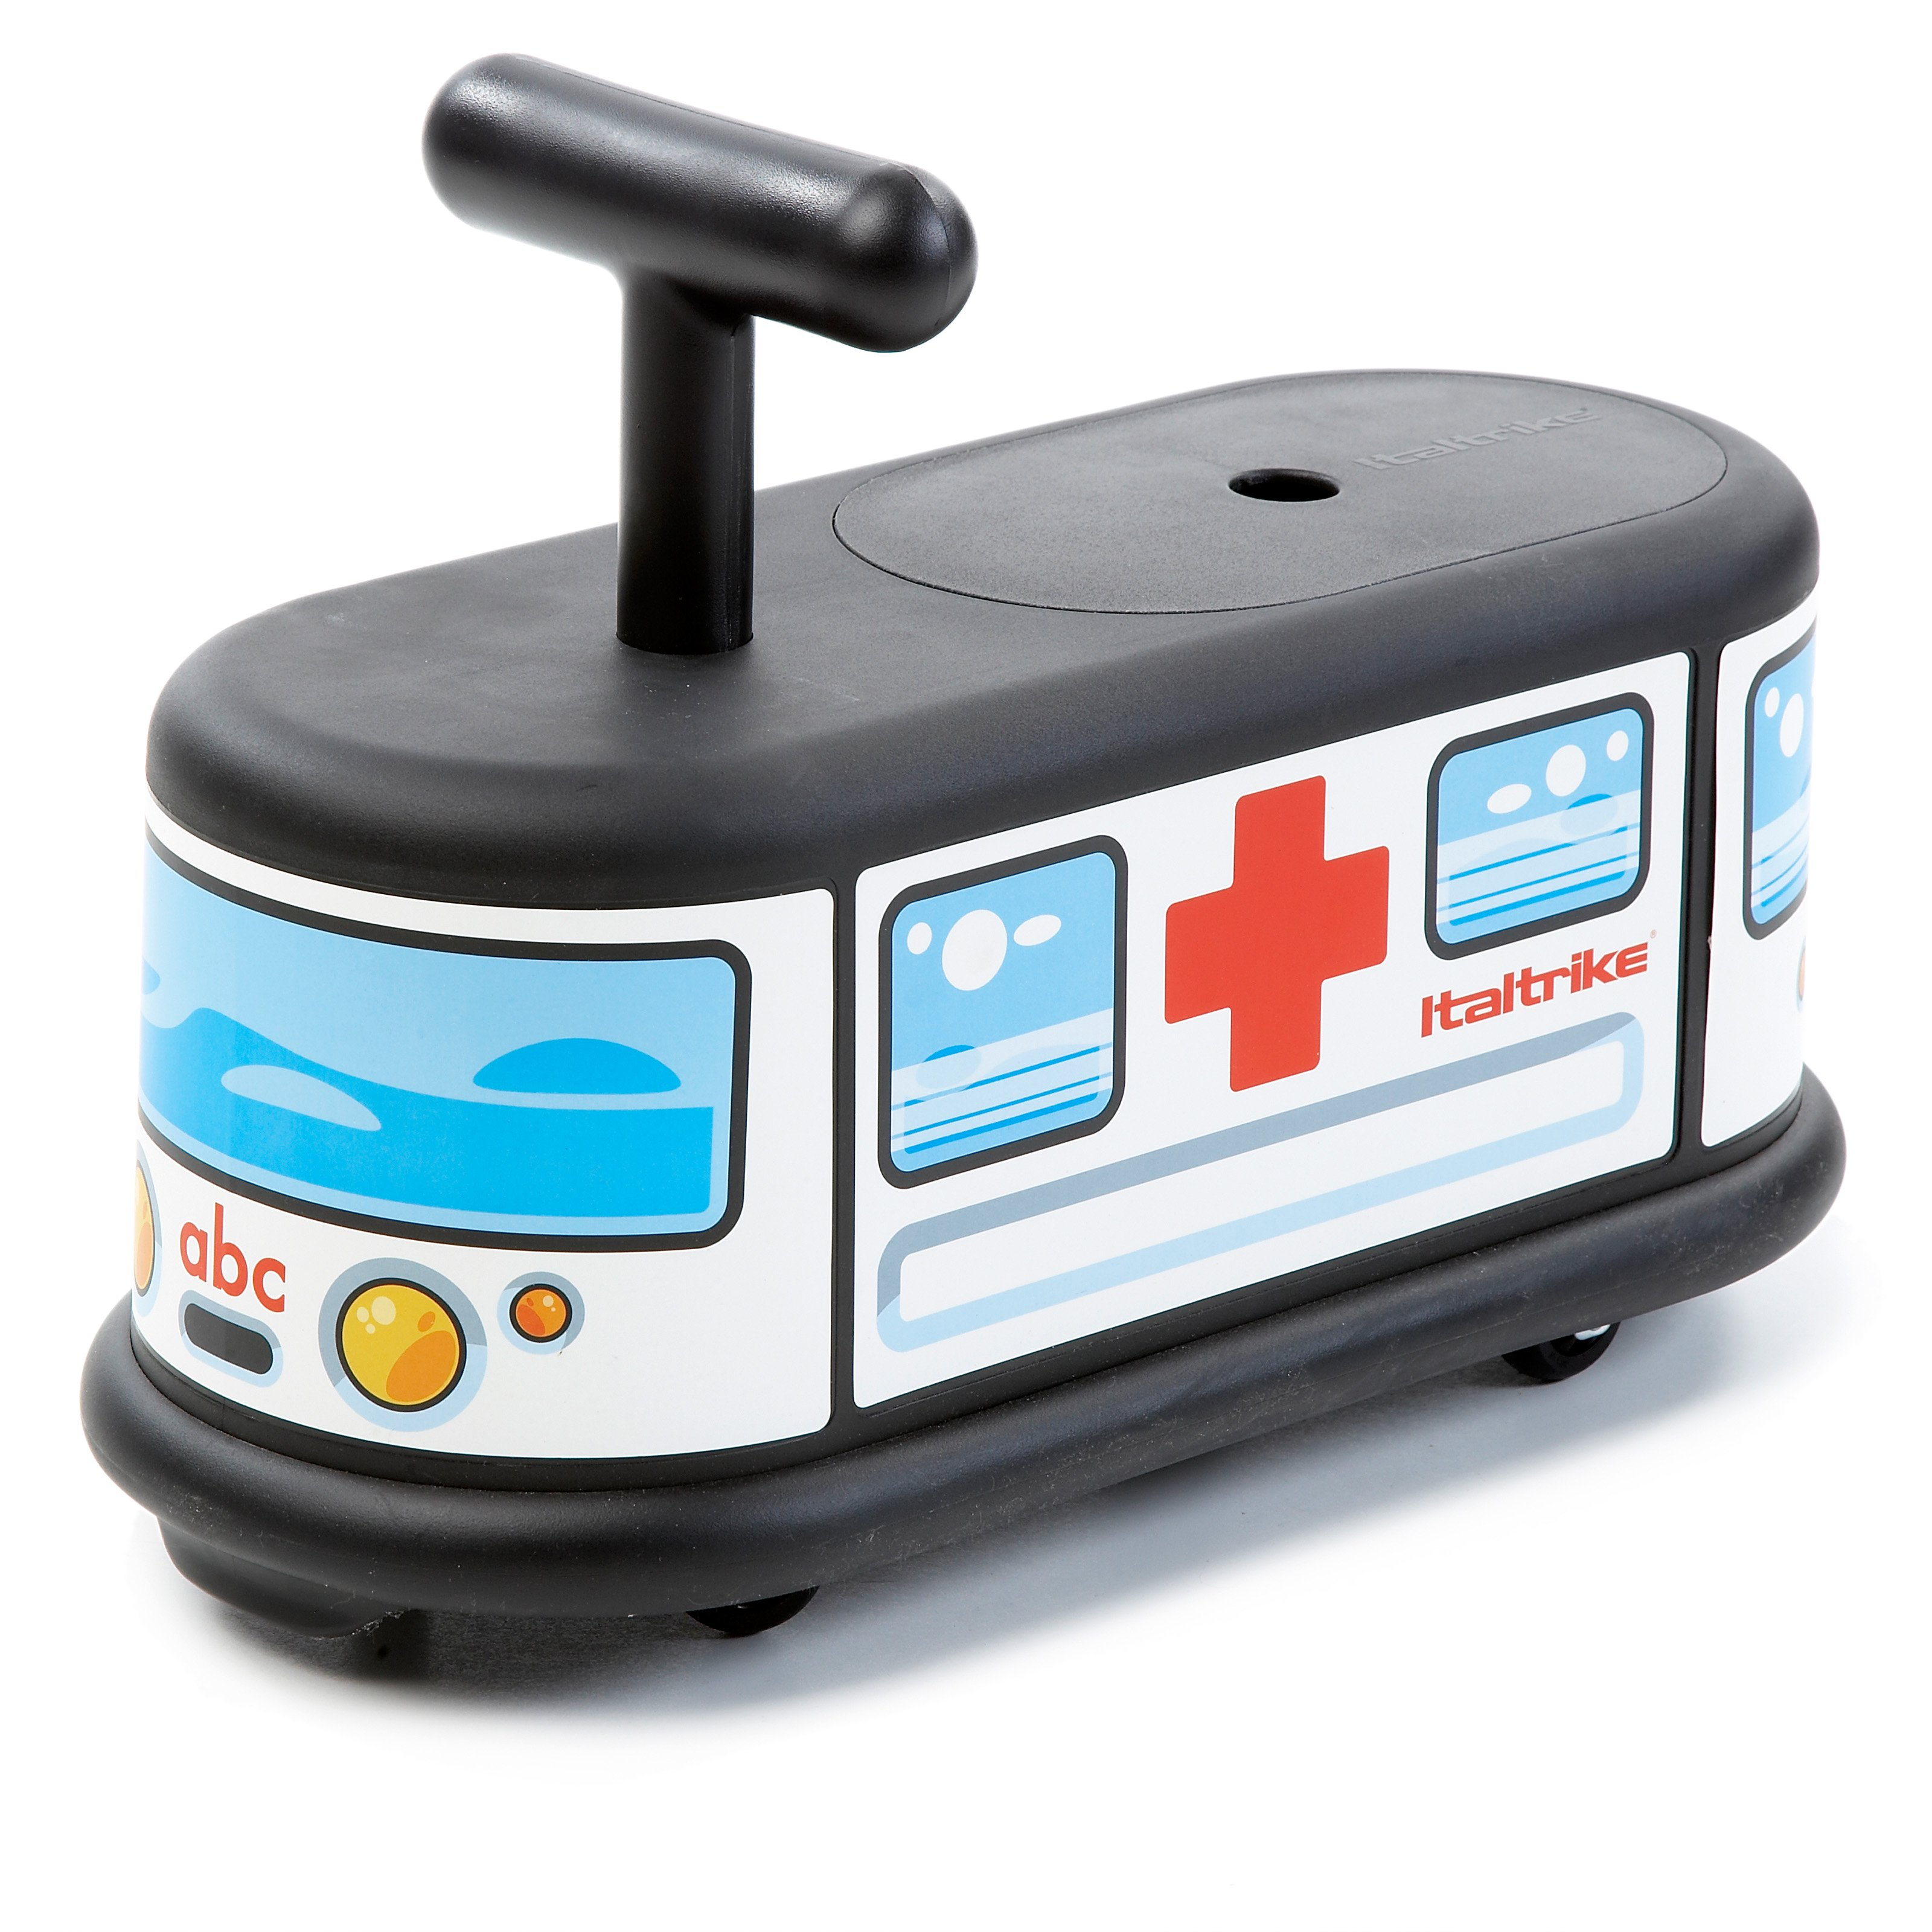 La Cosa Ambulance